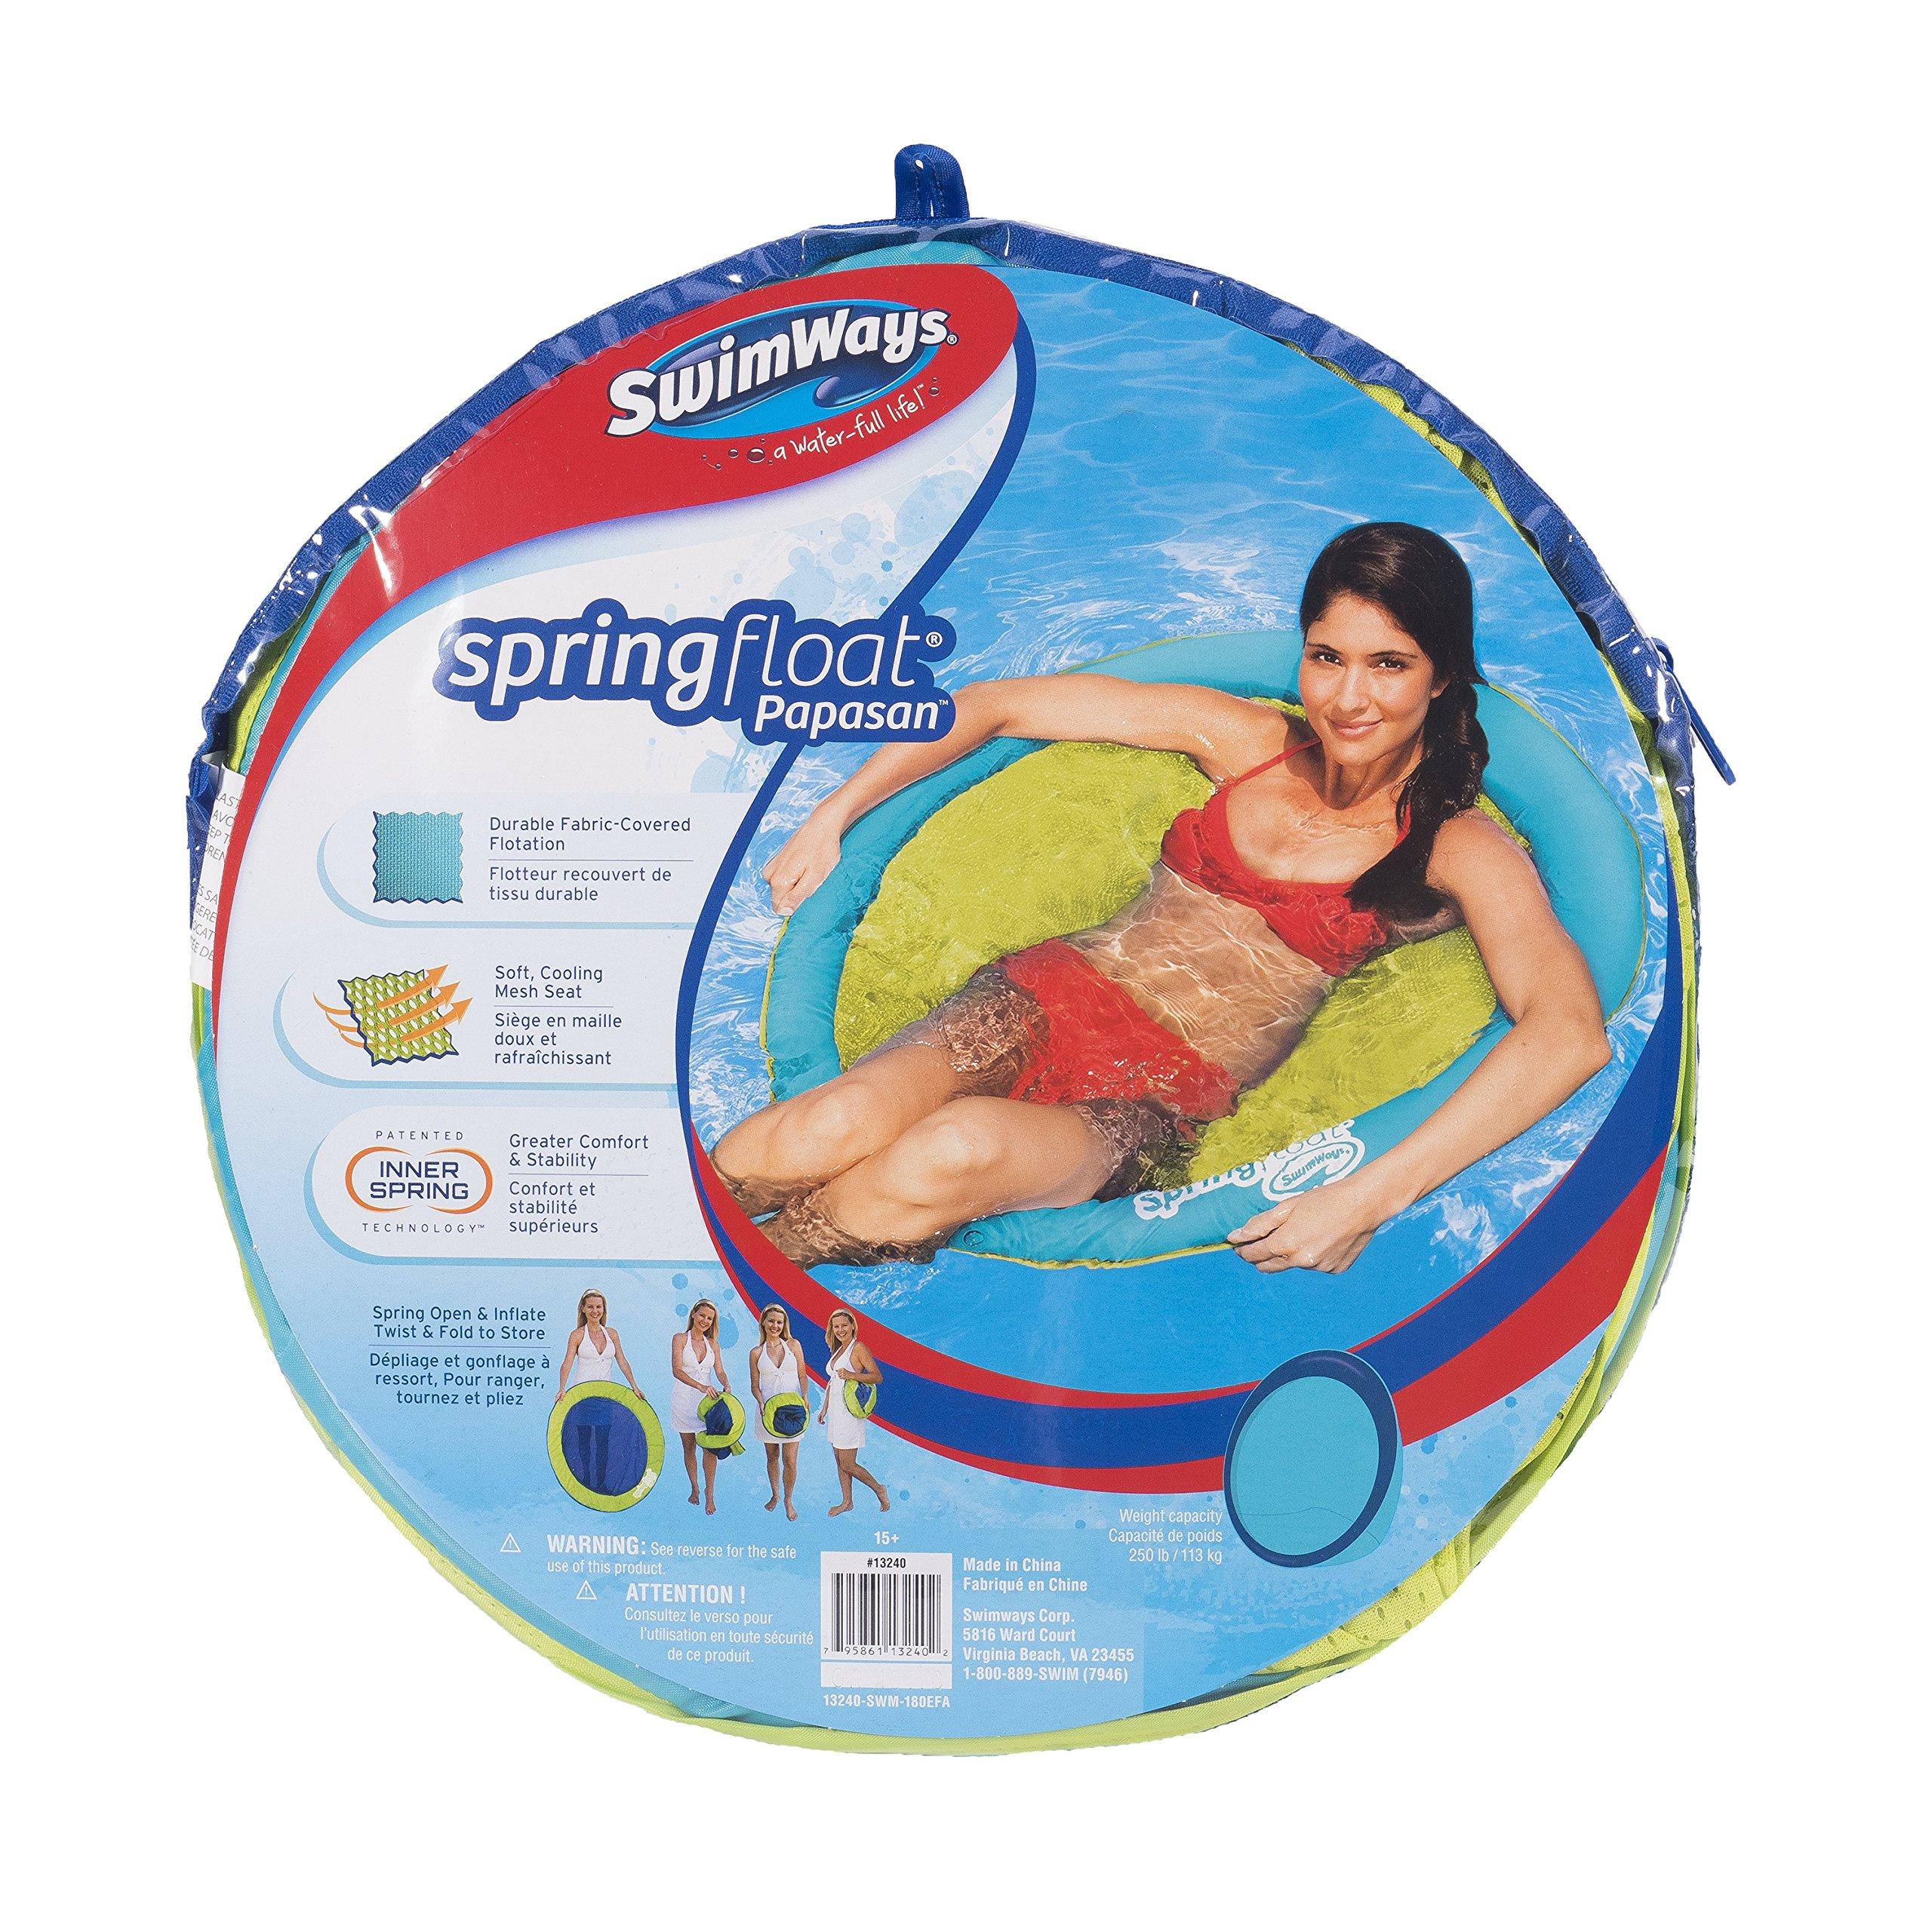 SwimWays Spring Float Papasan - Mesh Float for Pool or Lake - Light Blue/Lime by SwimWays (Image #3)